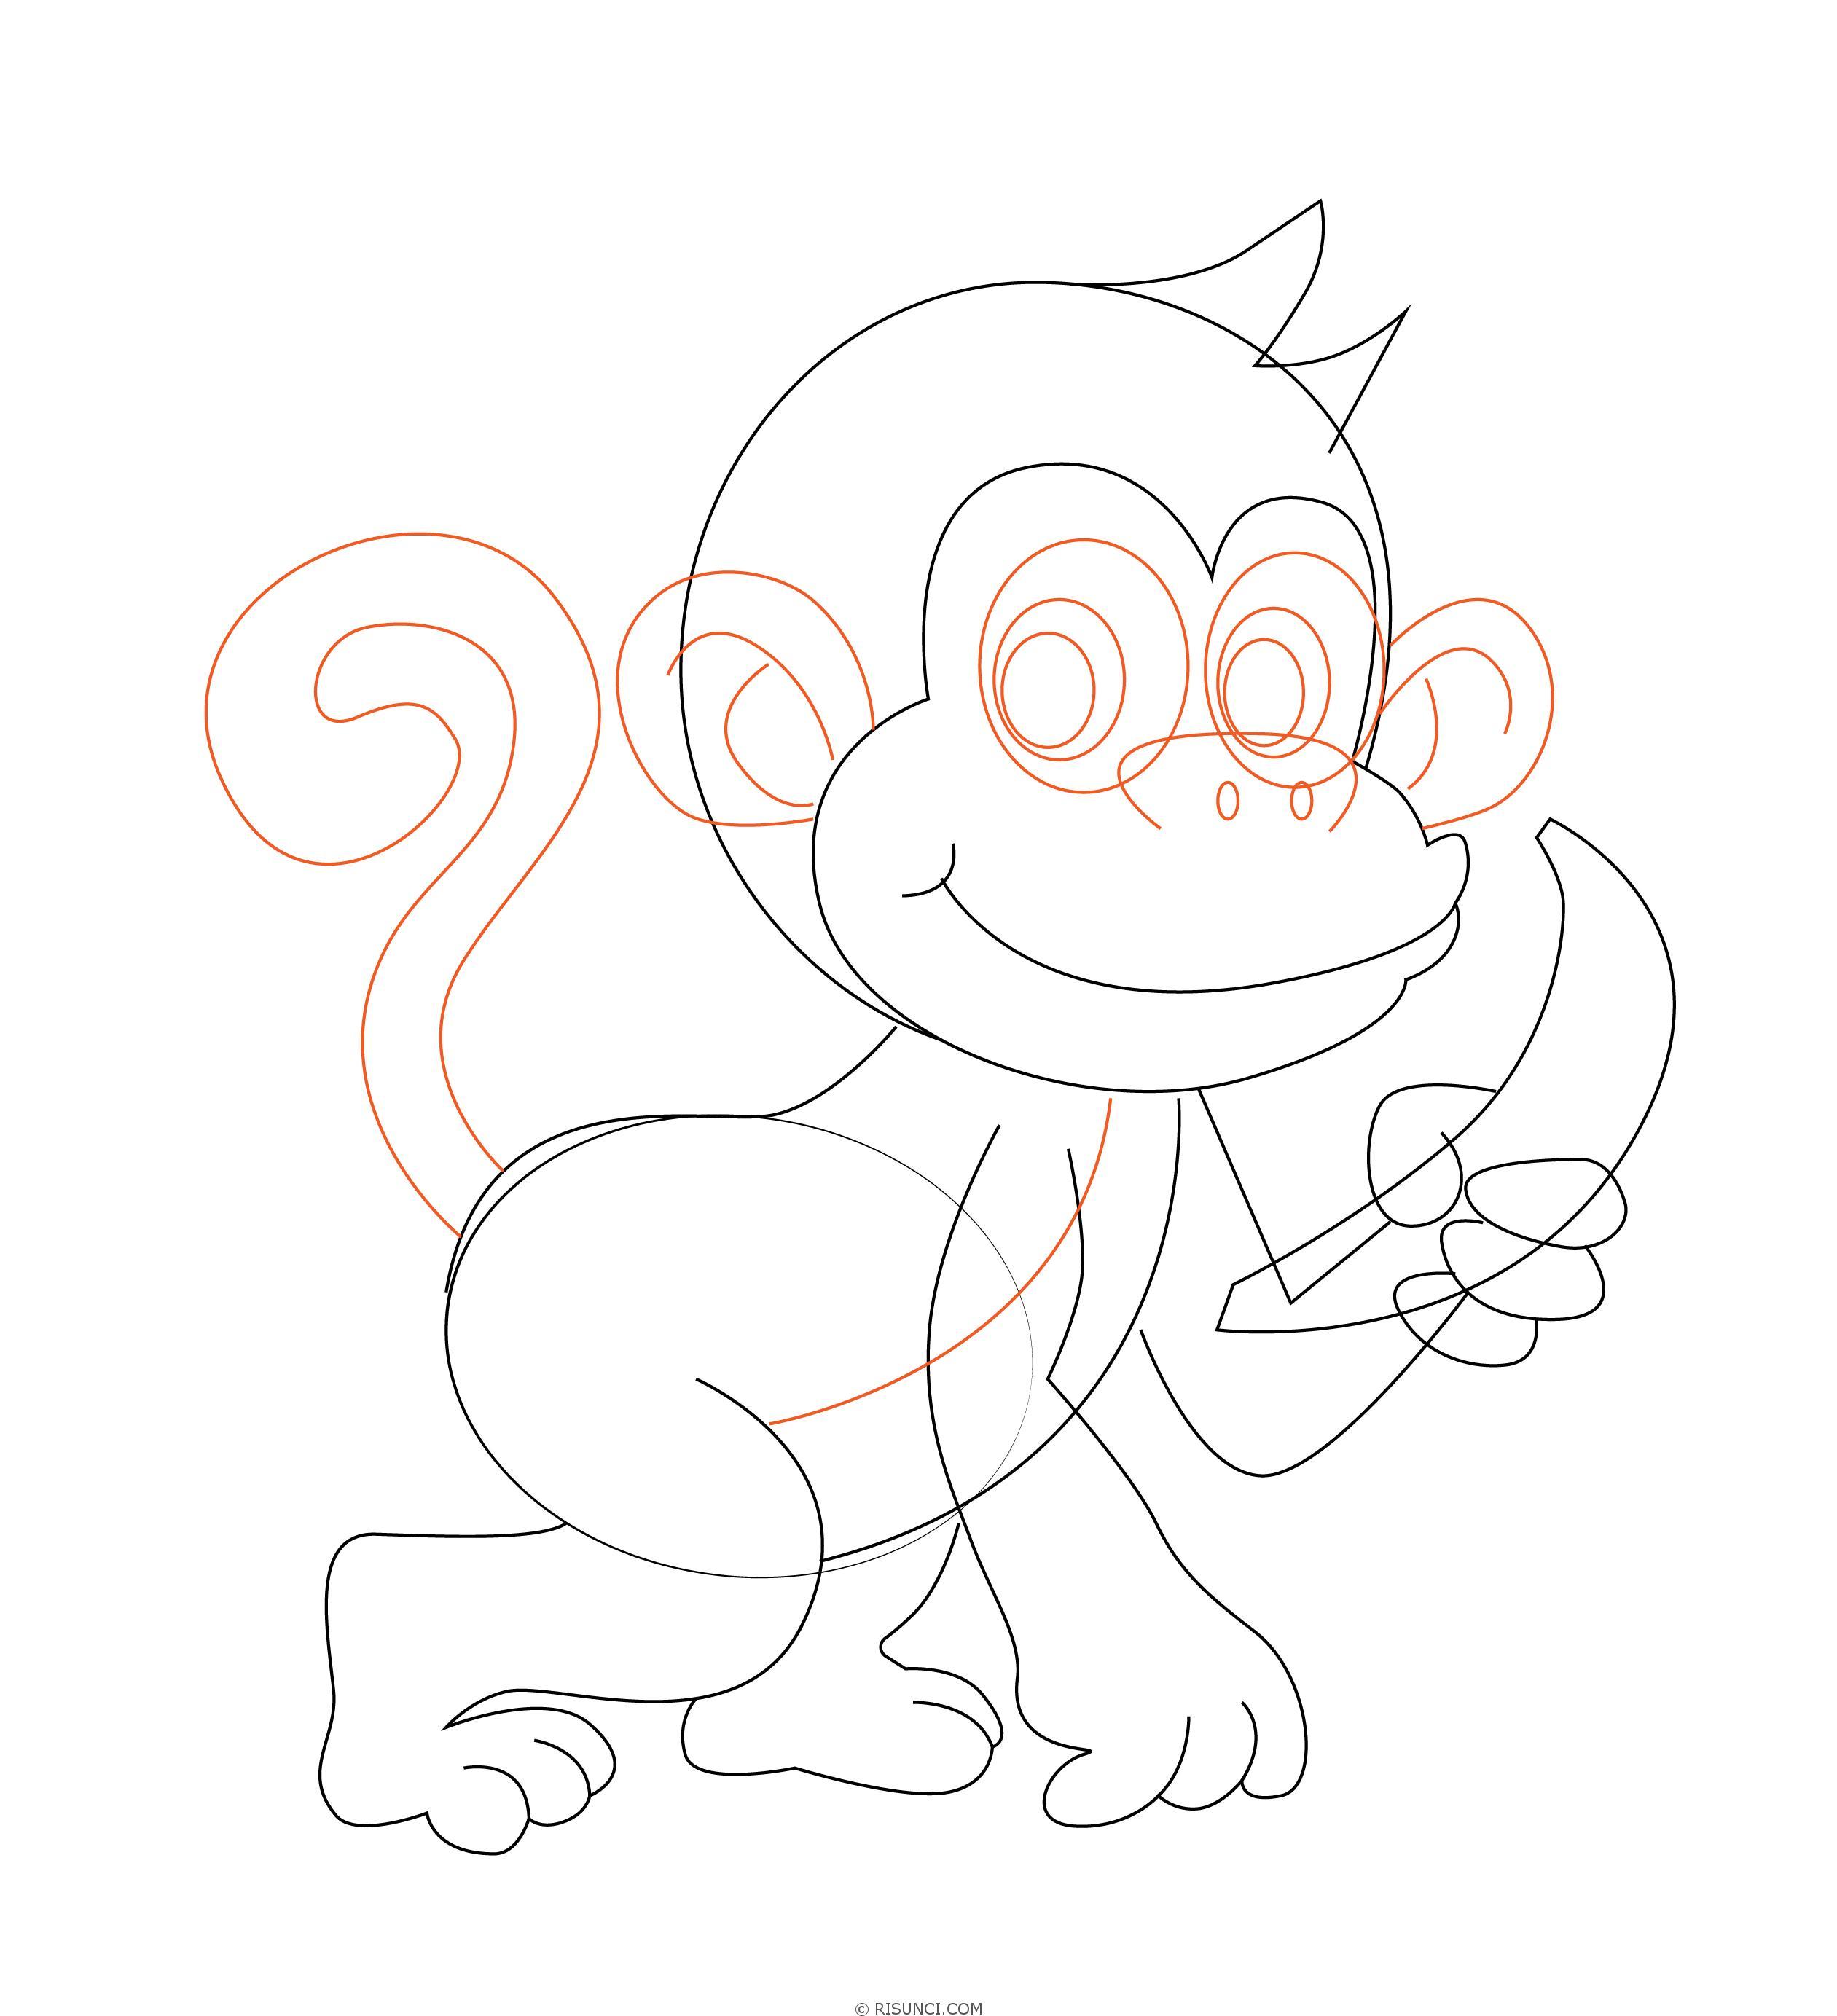 картинки обезьянку как нарисовать видео, можно